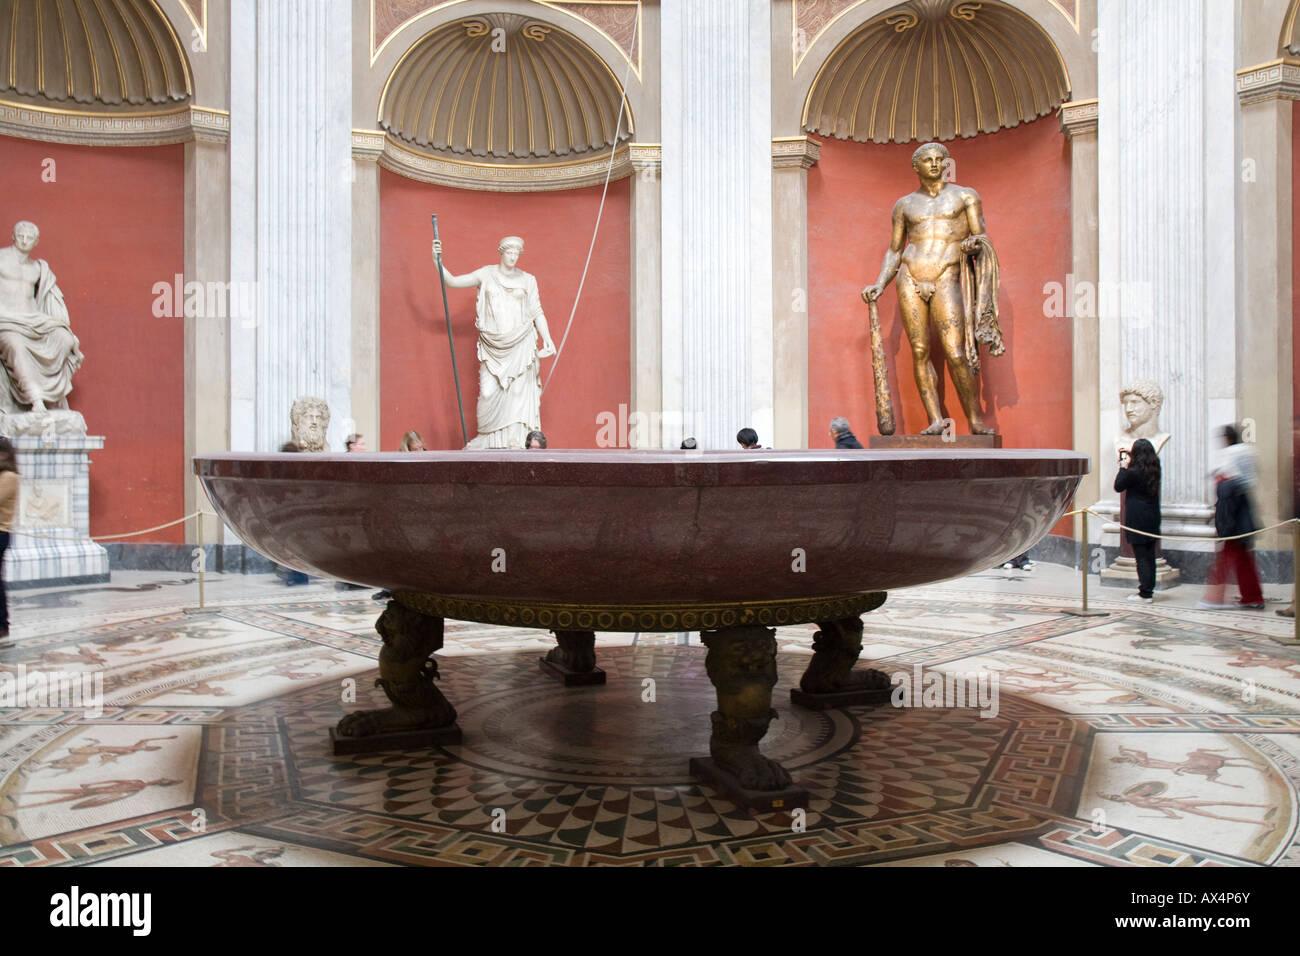 Emperor Nero's marble bathtub - Stock Image